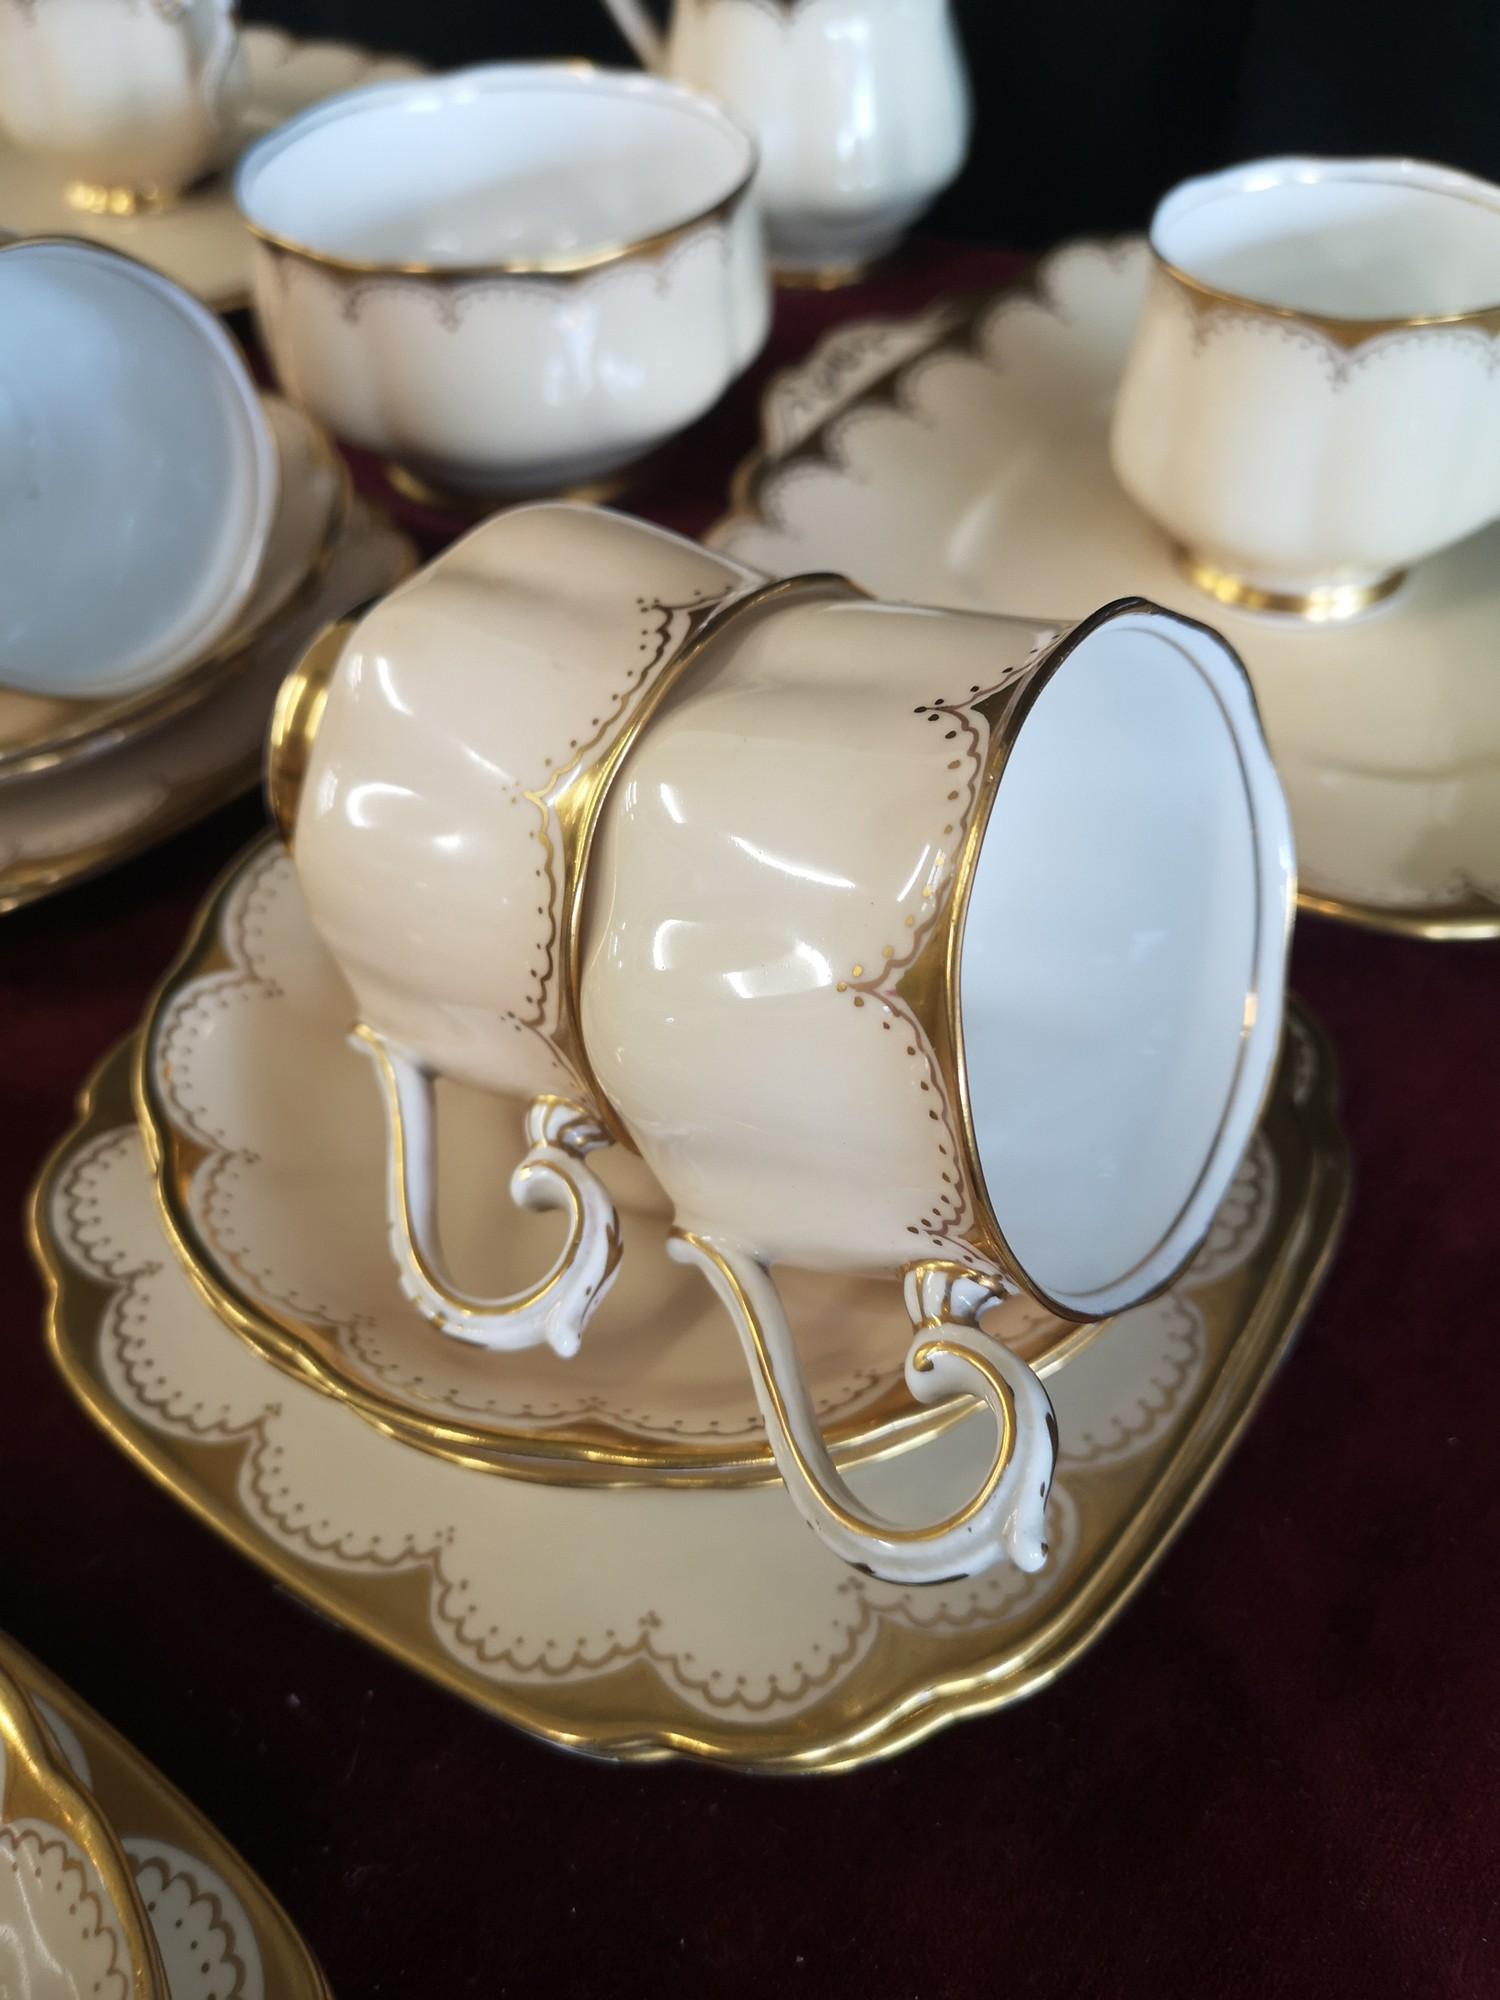 Large 1900s Royal Albert gilt tea set, set in cream back ground. - Image 2 of 10